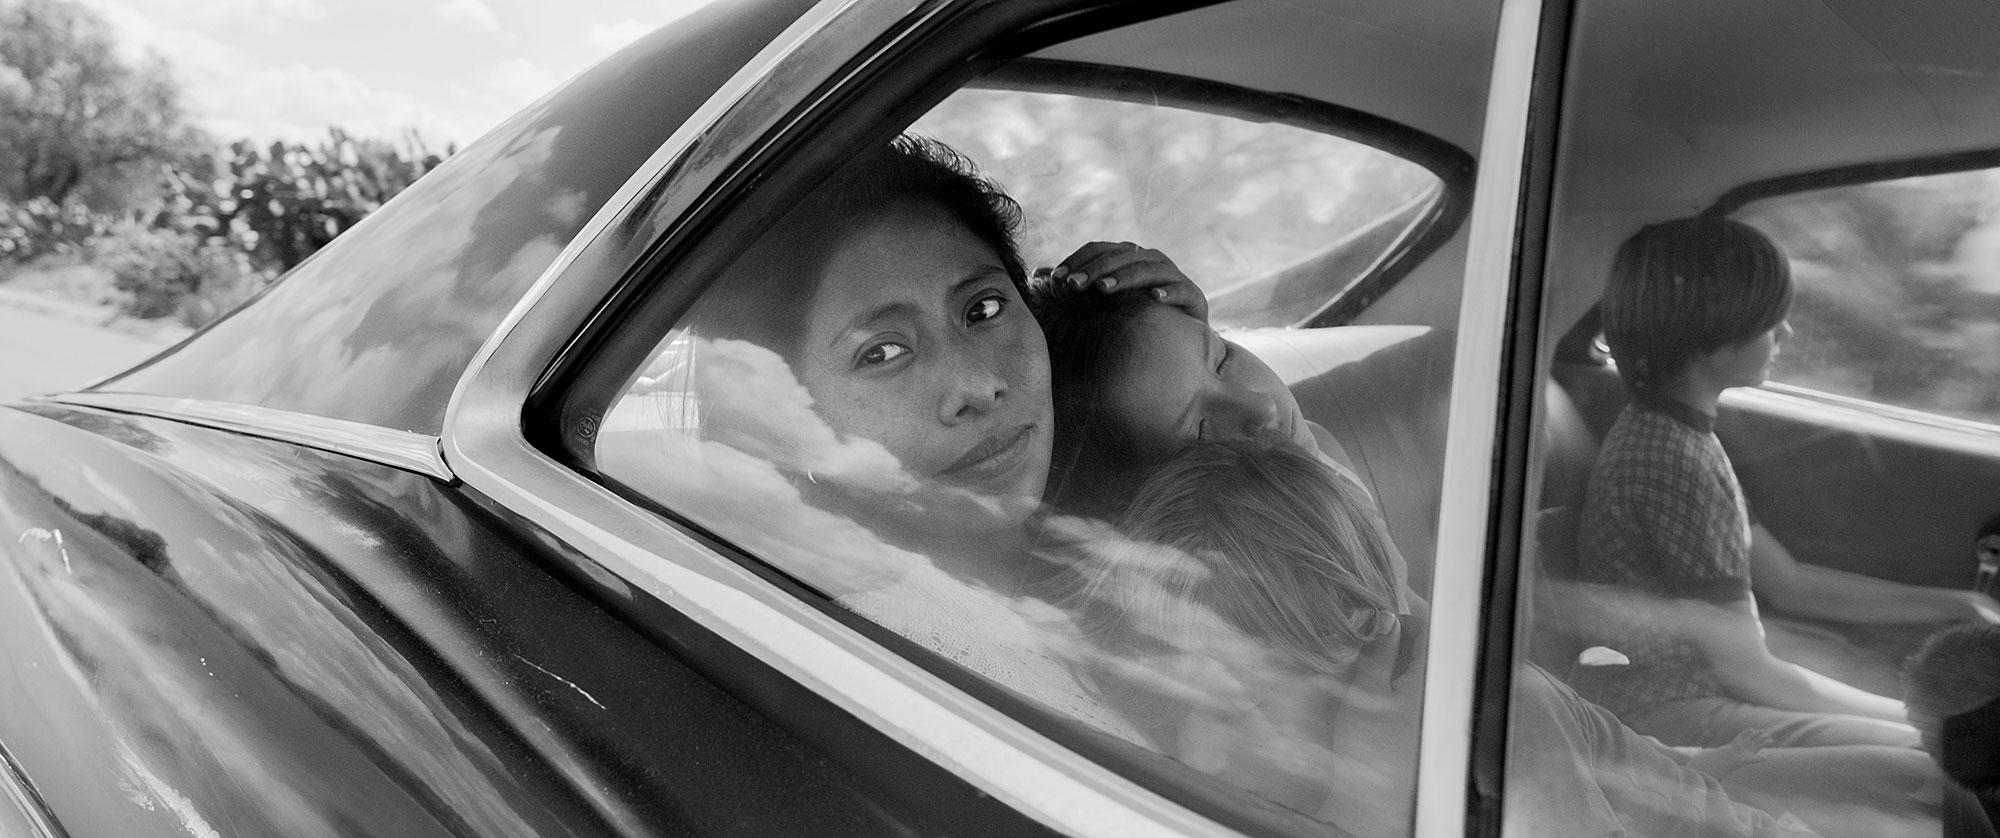 "Oscars 2019 Cinematography Alfonso Cuaron - ""Cold War,"" Lukasz Zal ""The Favourite,"" Robbie Ryan ""Never Look Away,"" Caleb Deschanel ""Roma,"" Alfonso Cuarón ""A Star Is Born,"" Matthew Libatique"